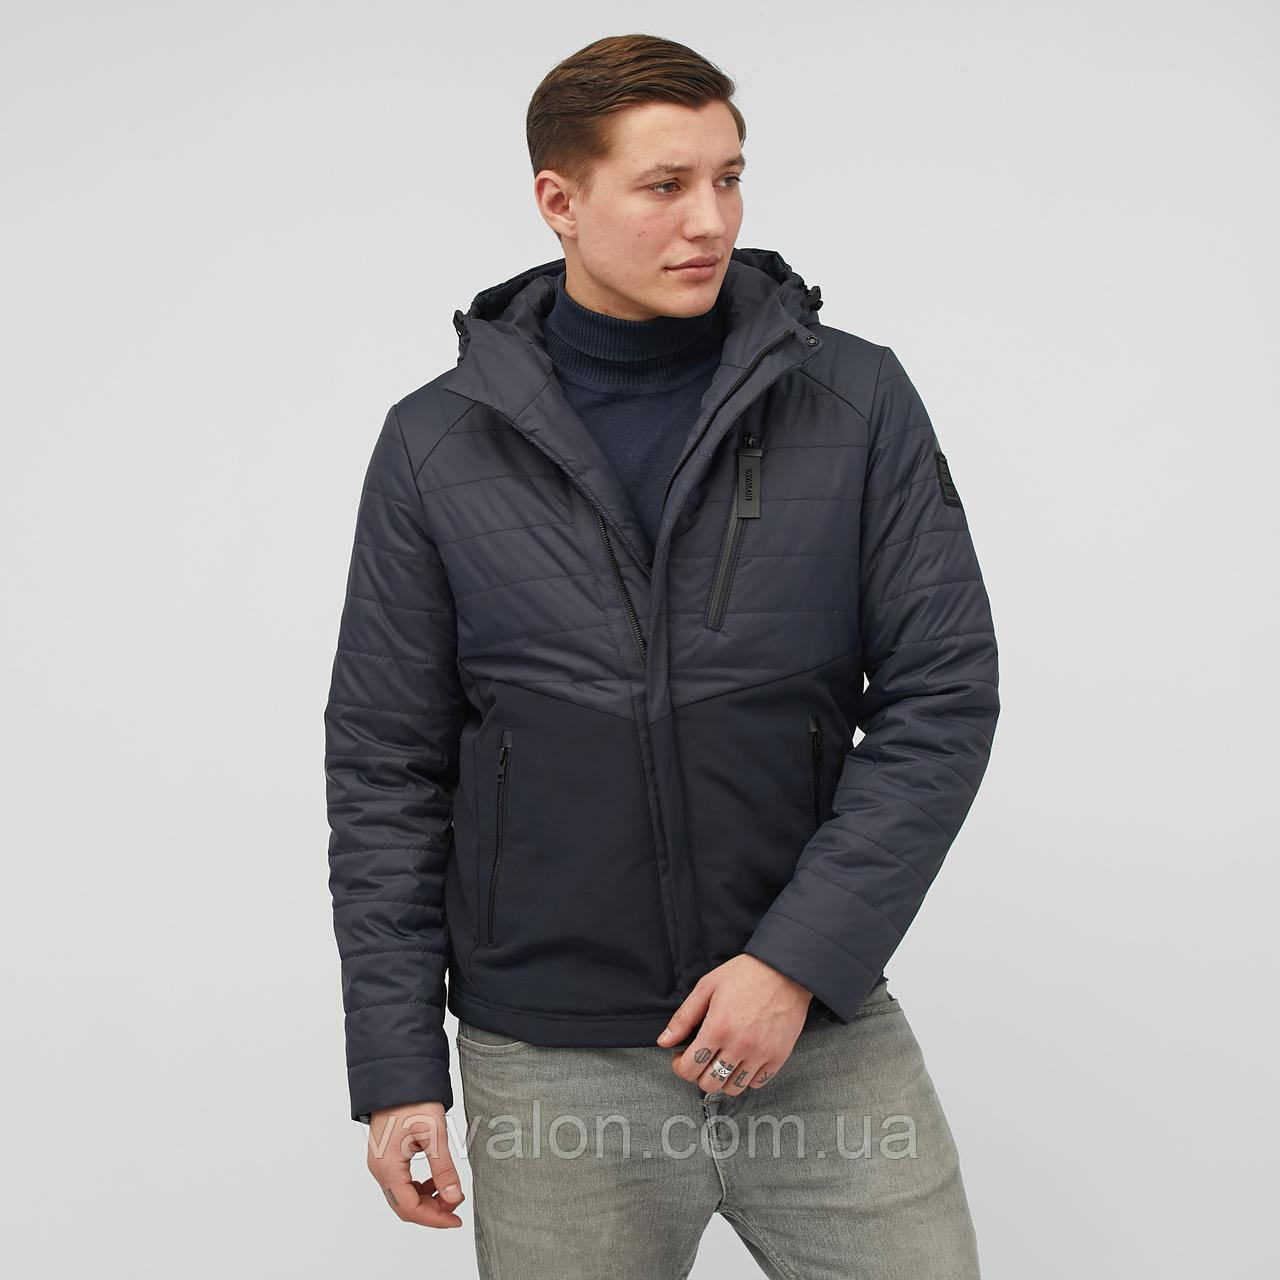 Куртка демисезонная Vavalon KD-801 Navy